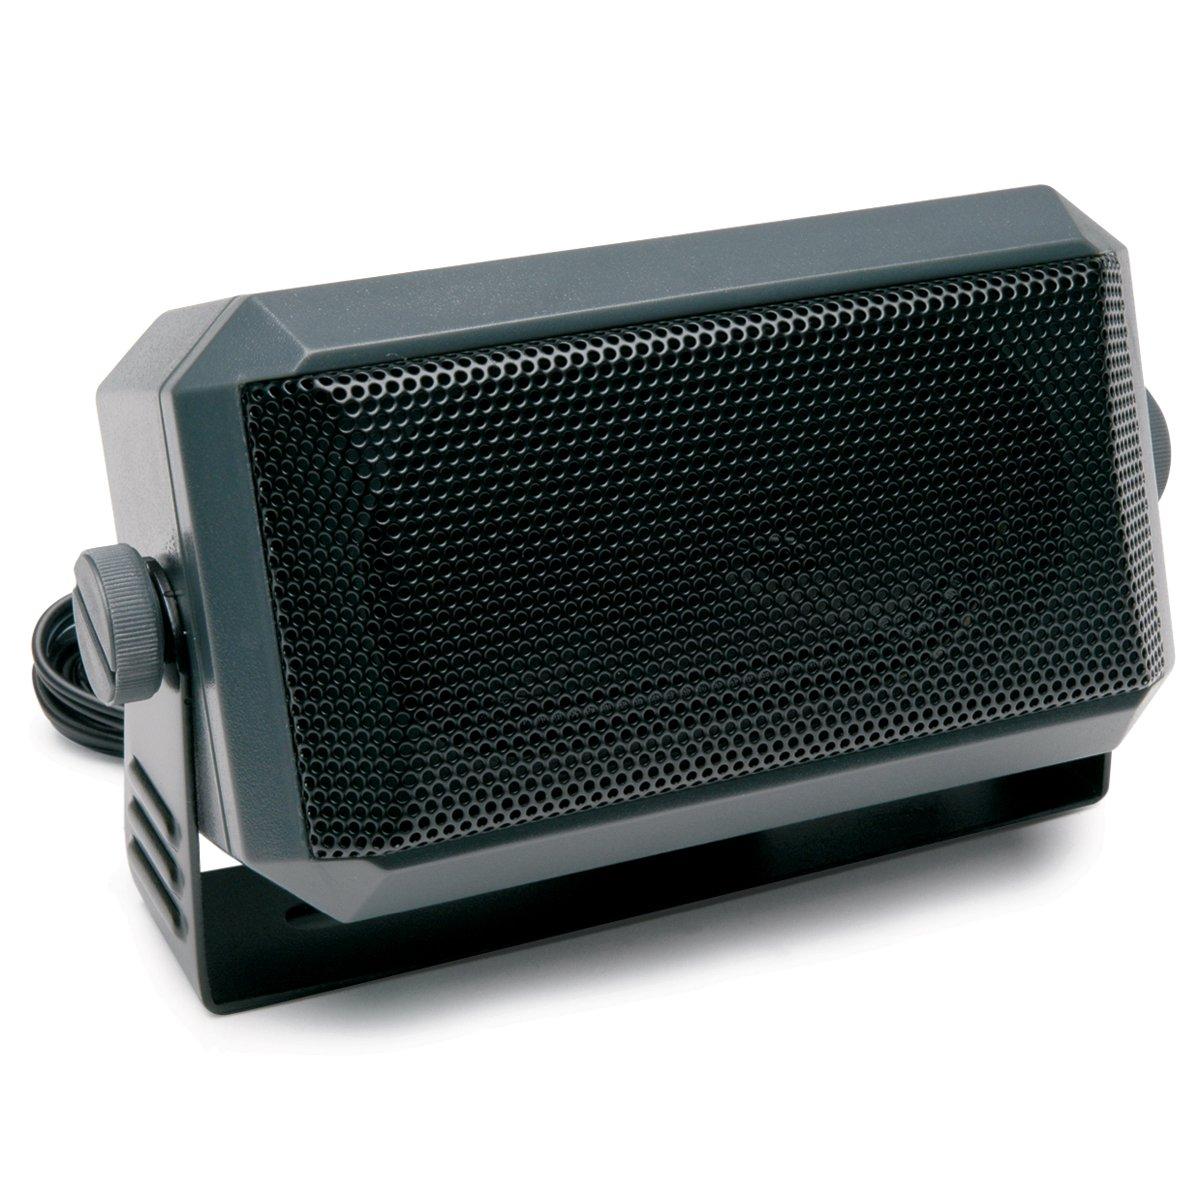 RoadPro RPSP 15 Universal Extension Speaker